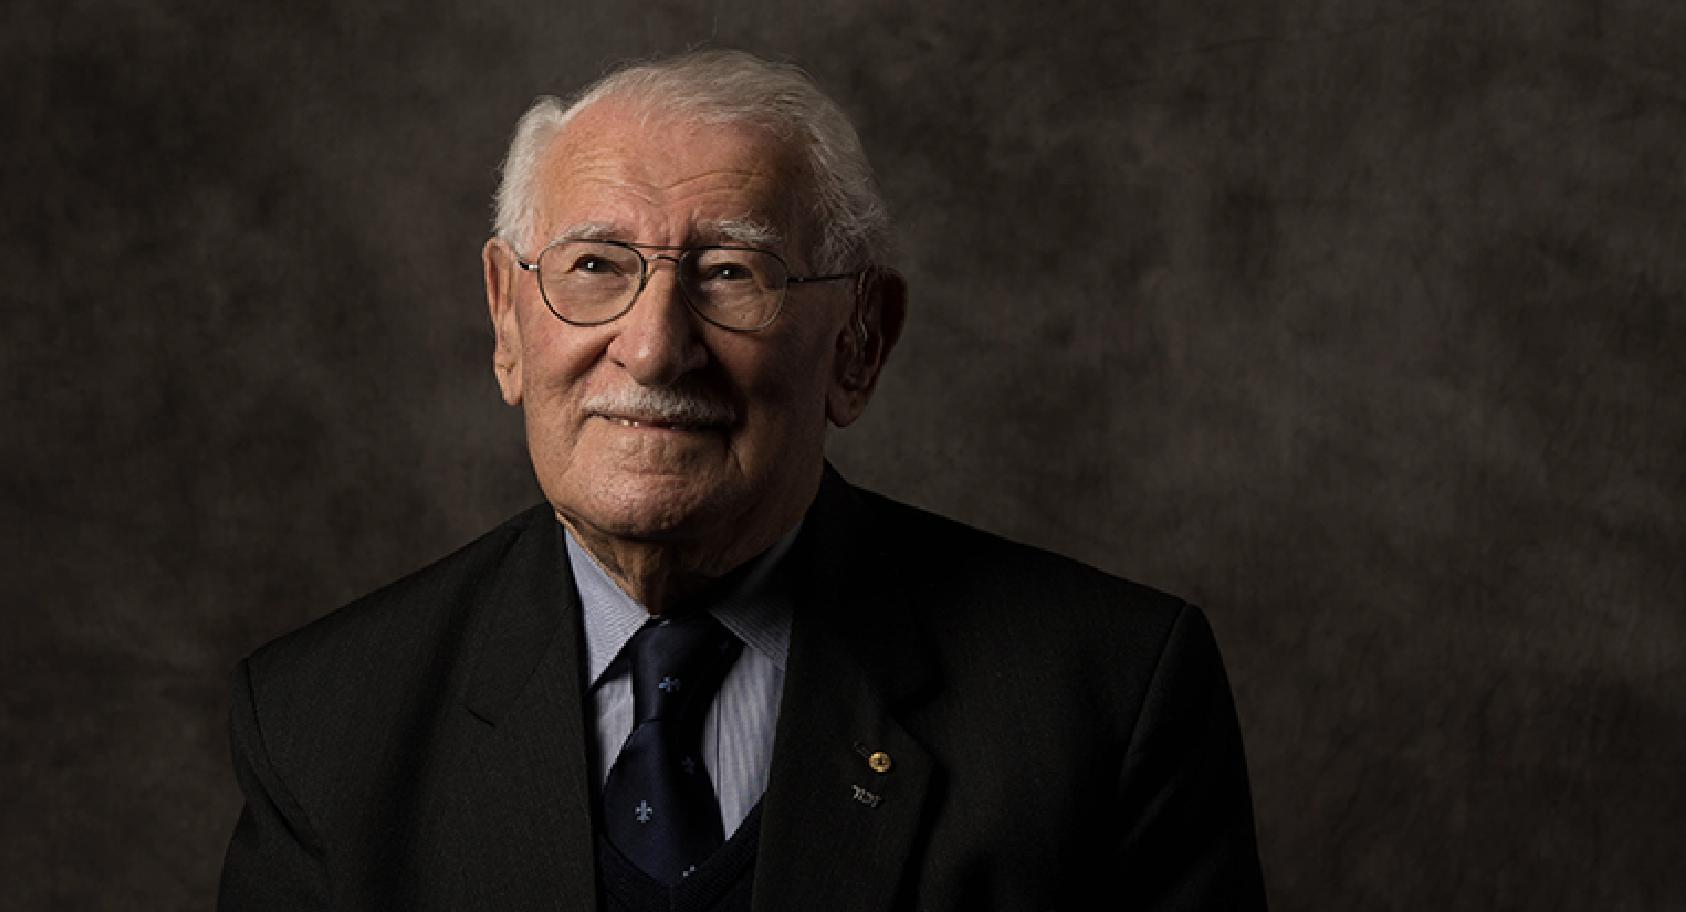 Photograph of Holocaust survivor Eddie Jaku smiling